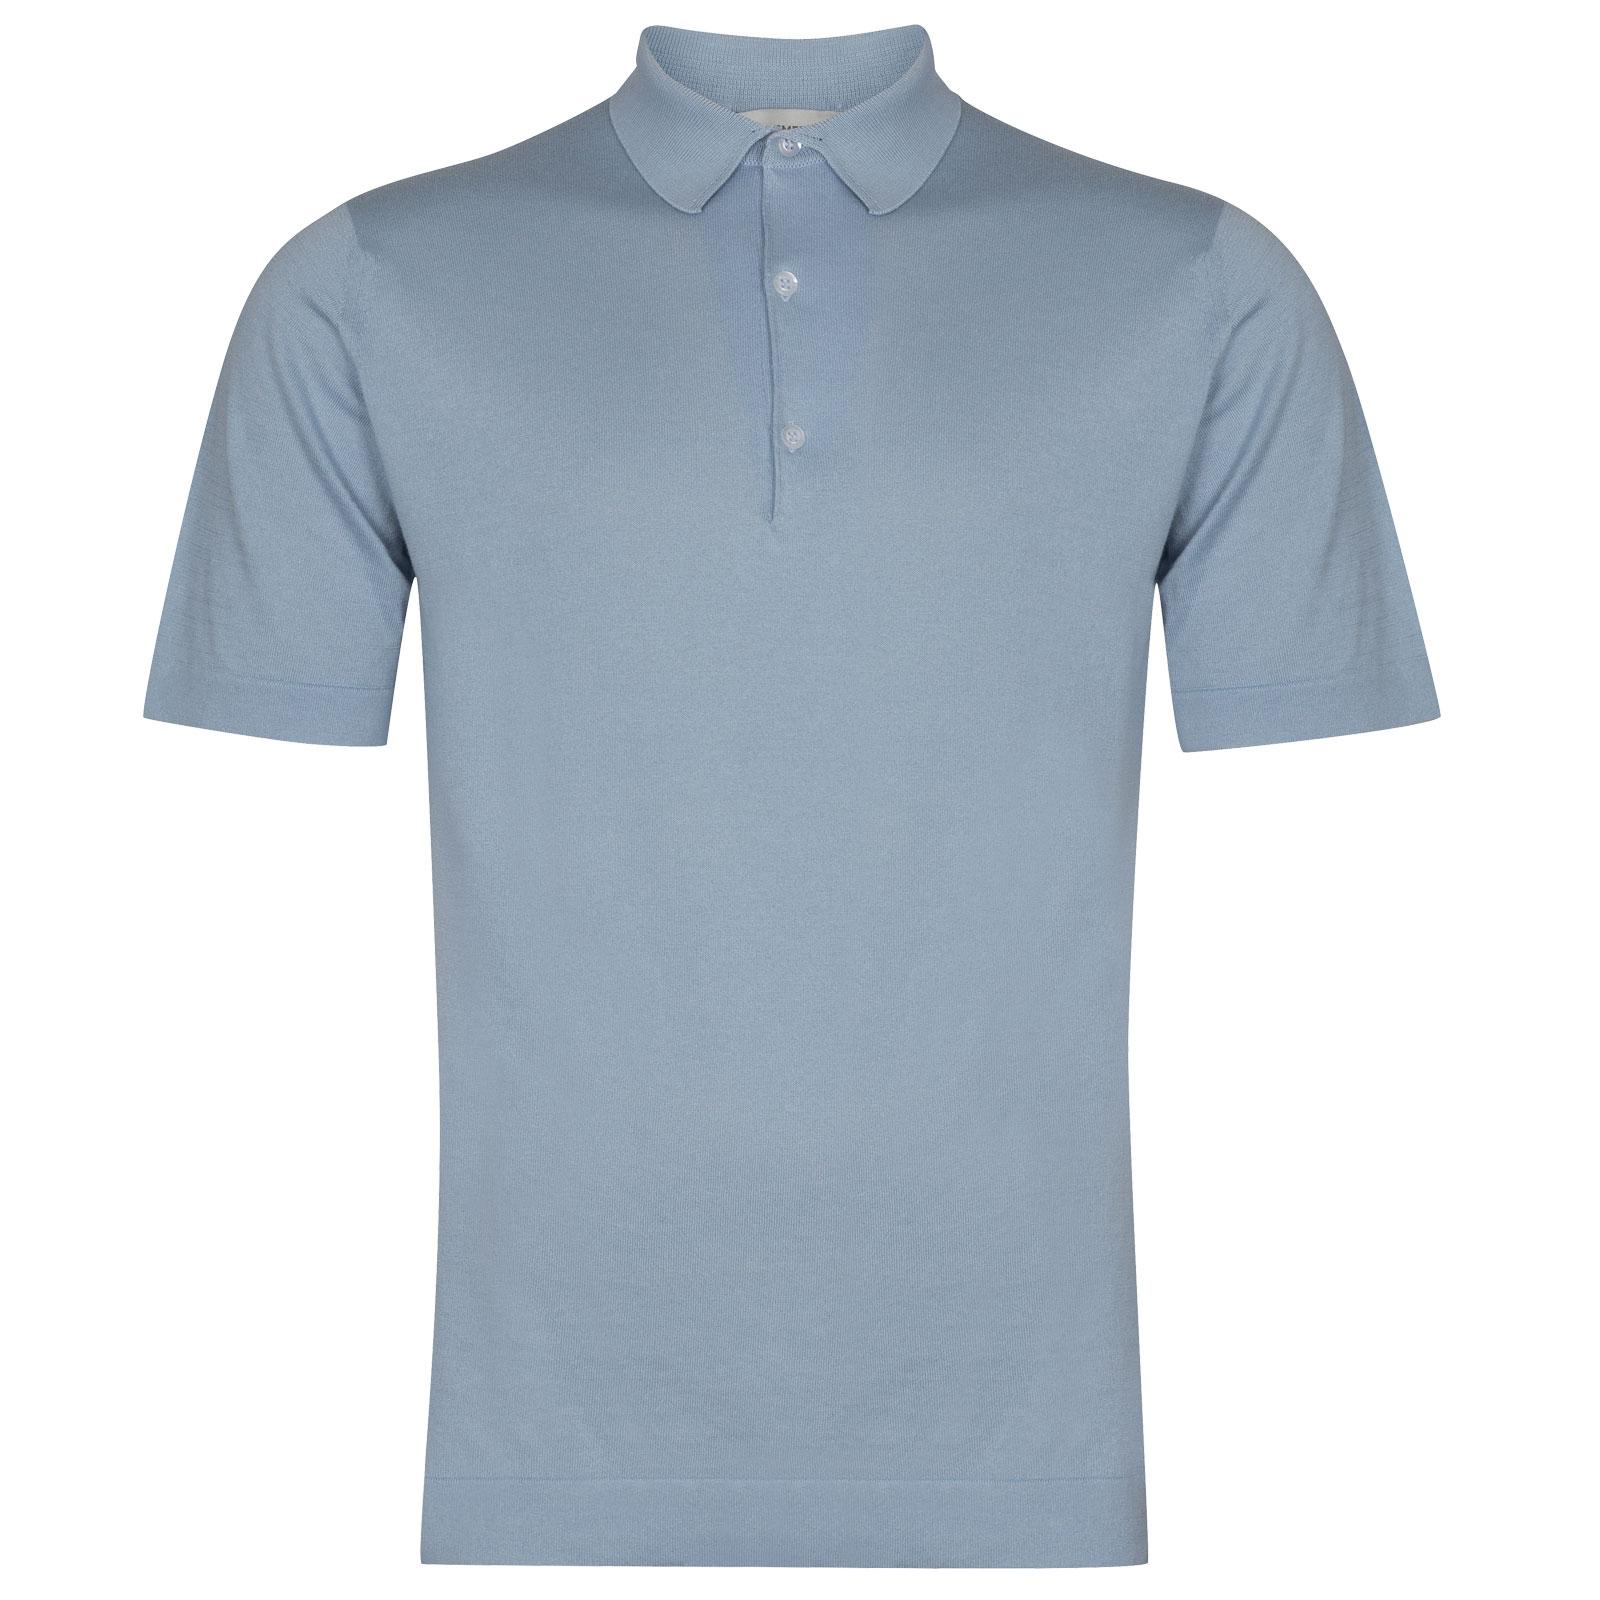 John Smedley Mycroft in Dusk Blue Shirt-LGE